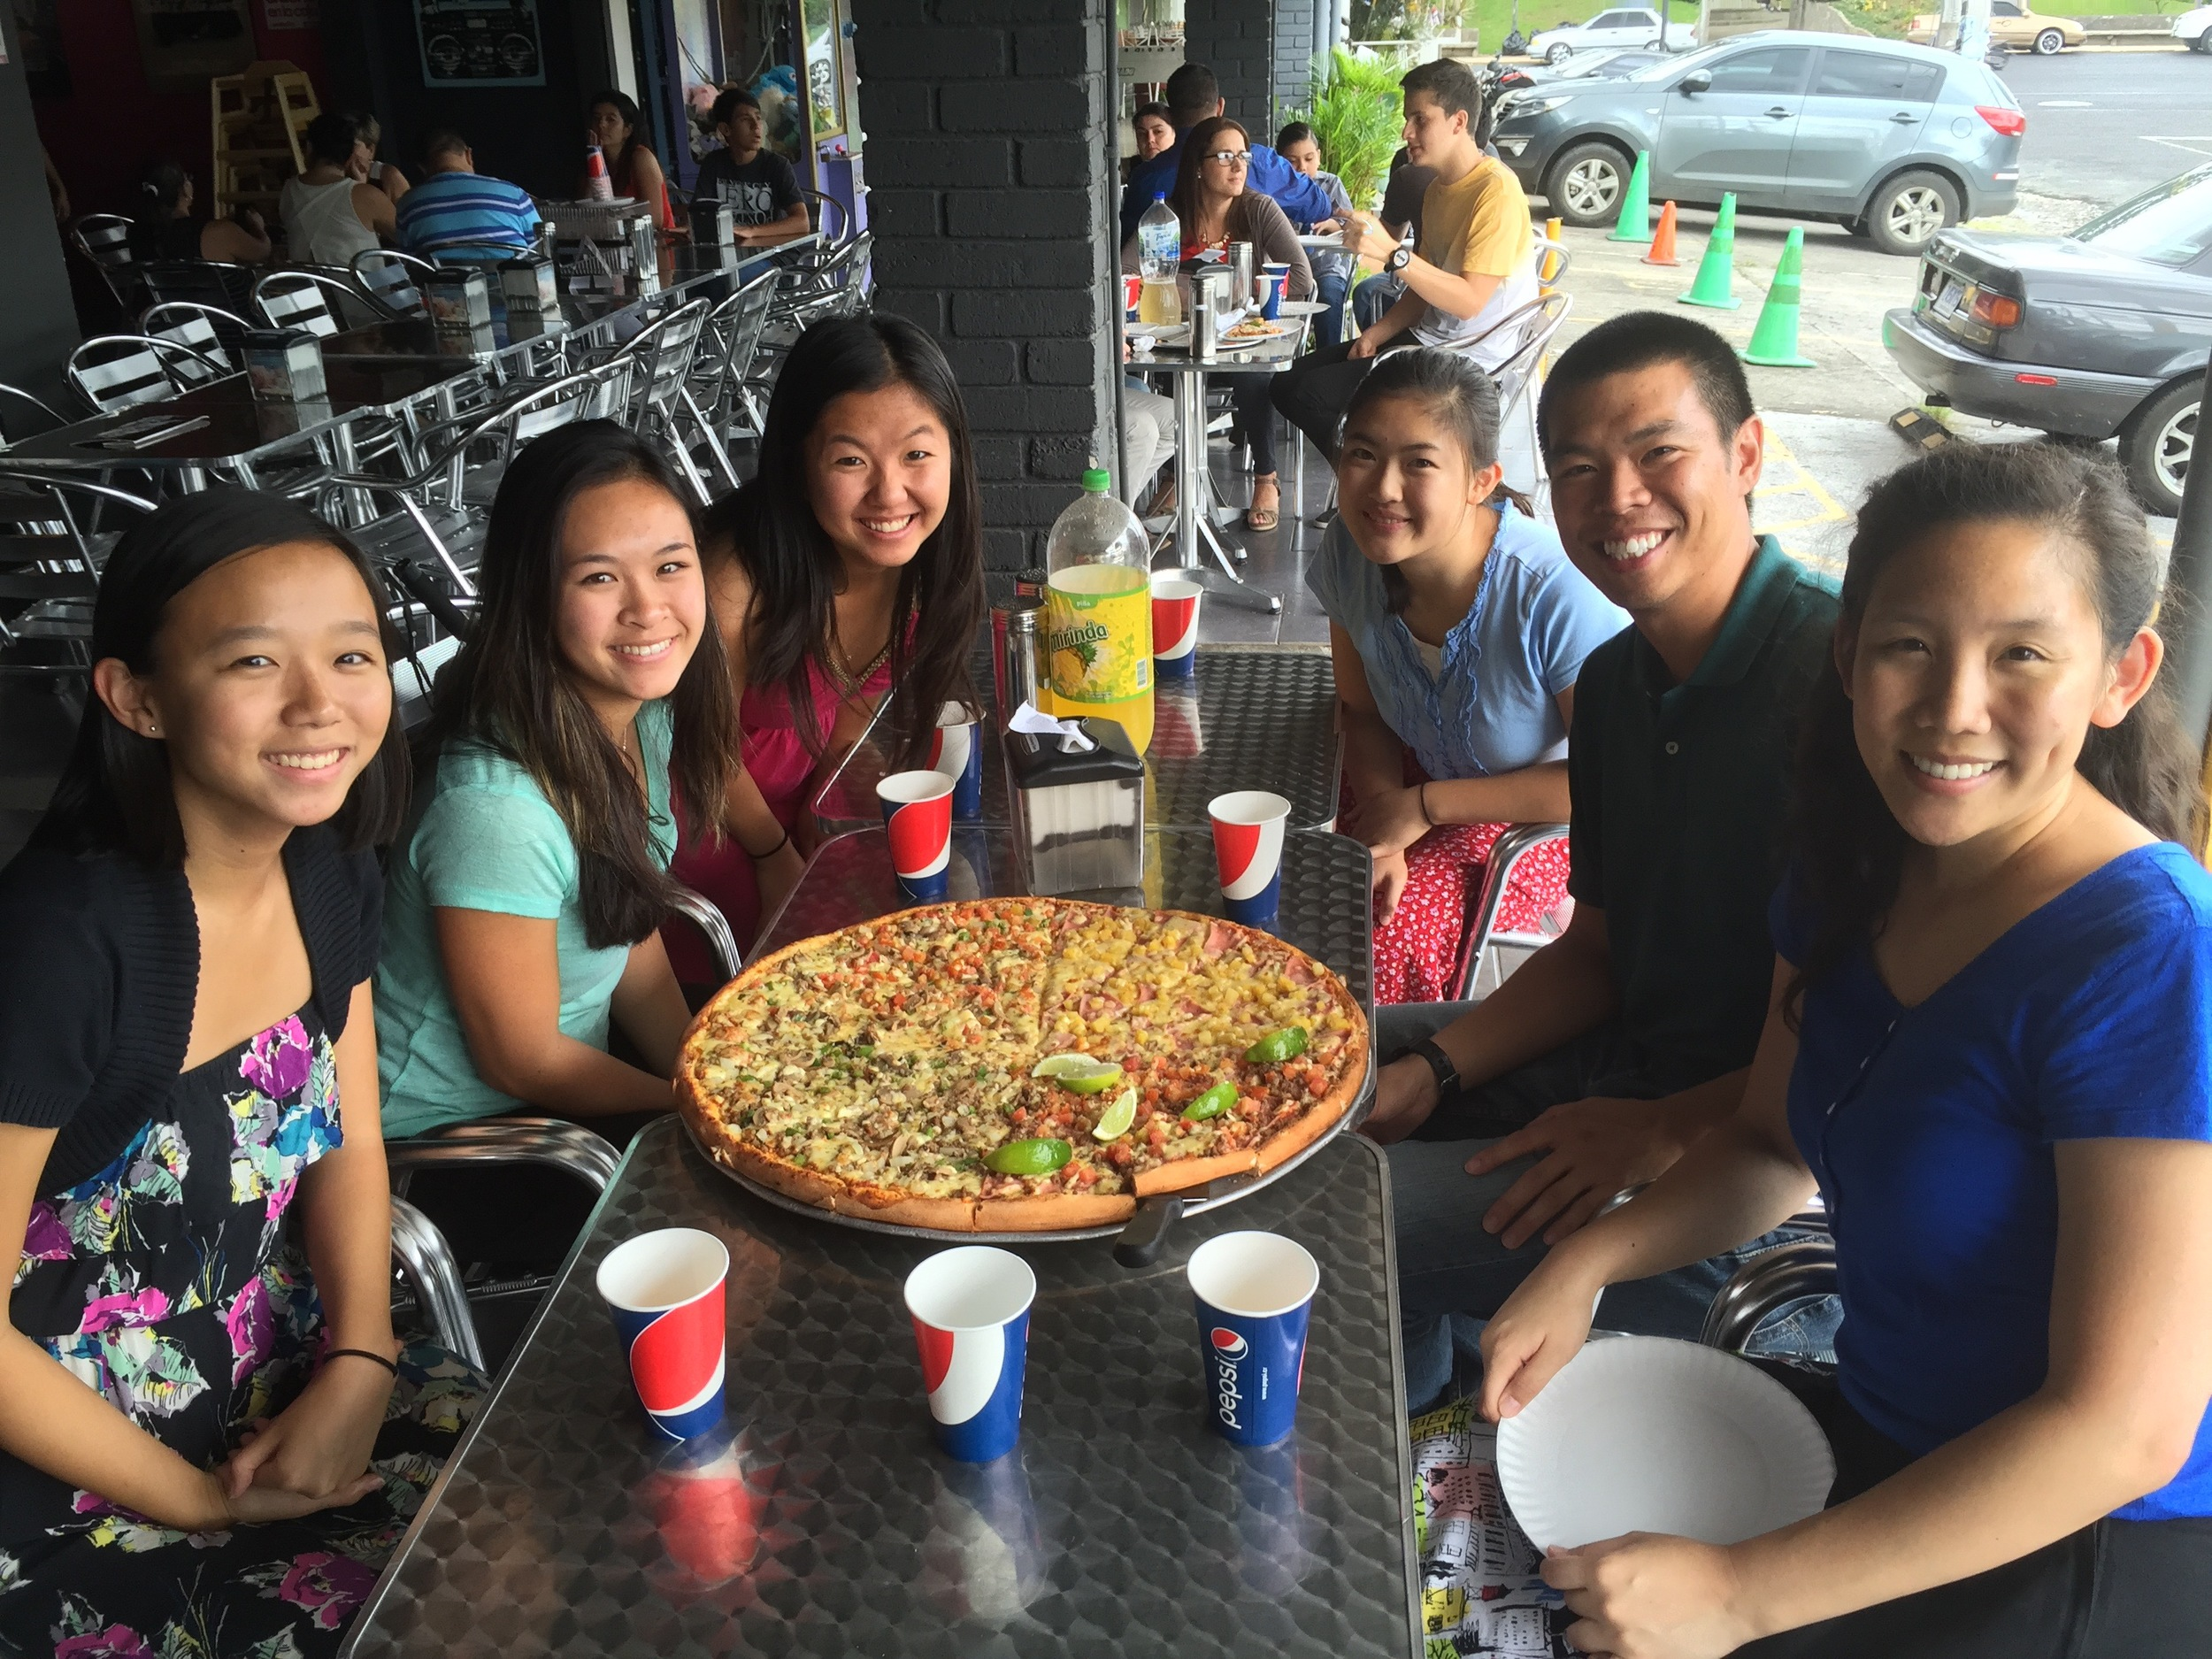 Us.. vs. Pizza...